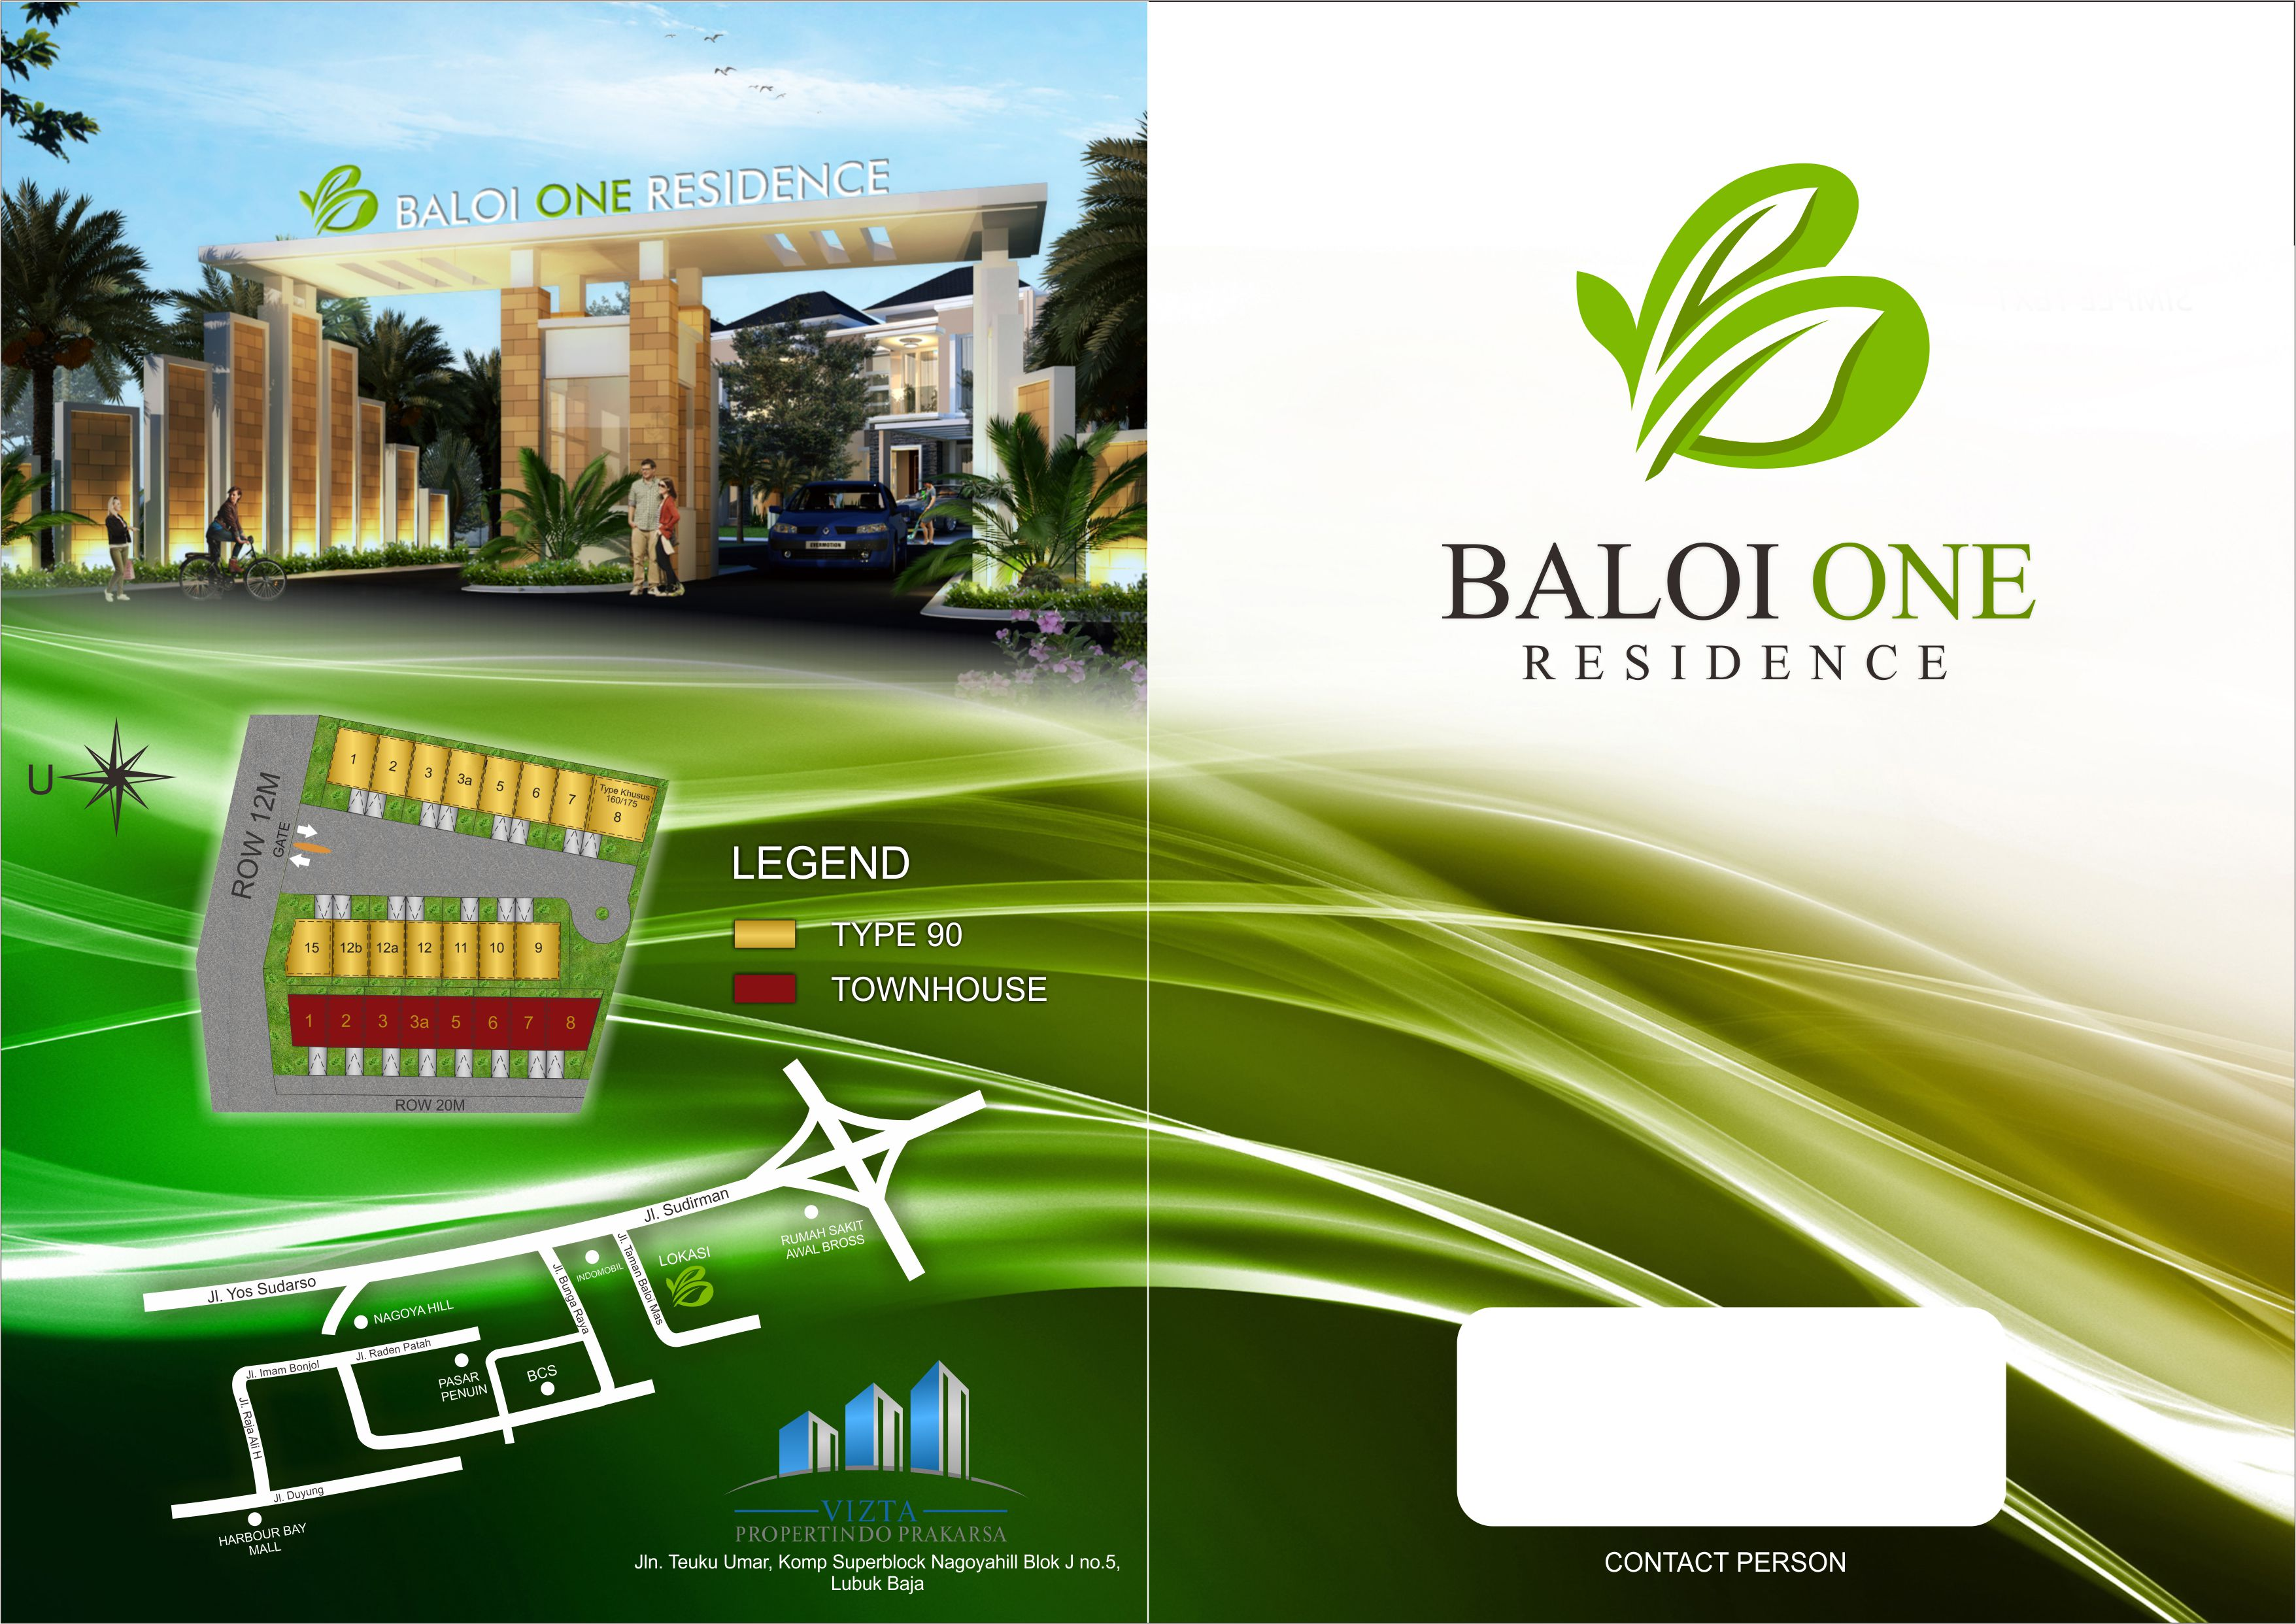 Baloi One Residence